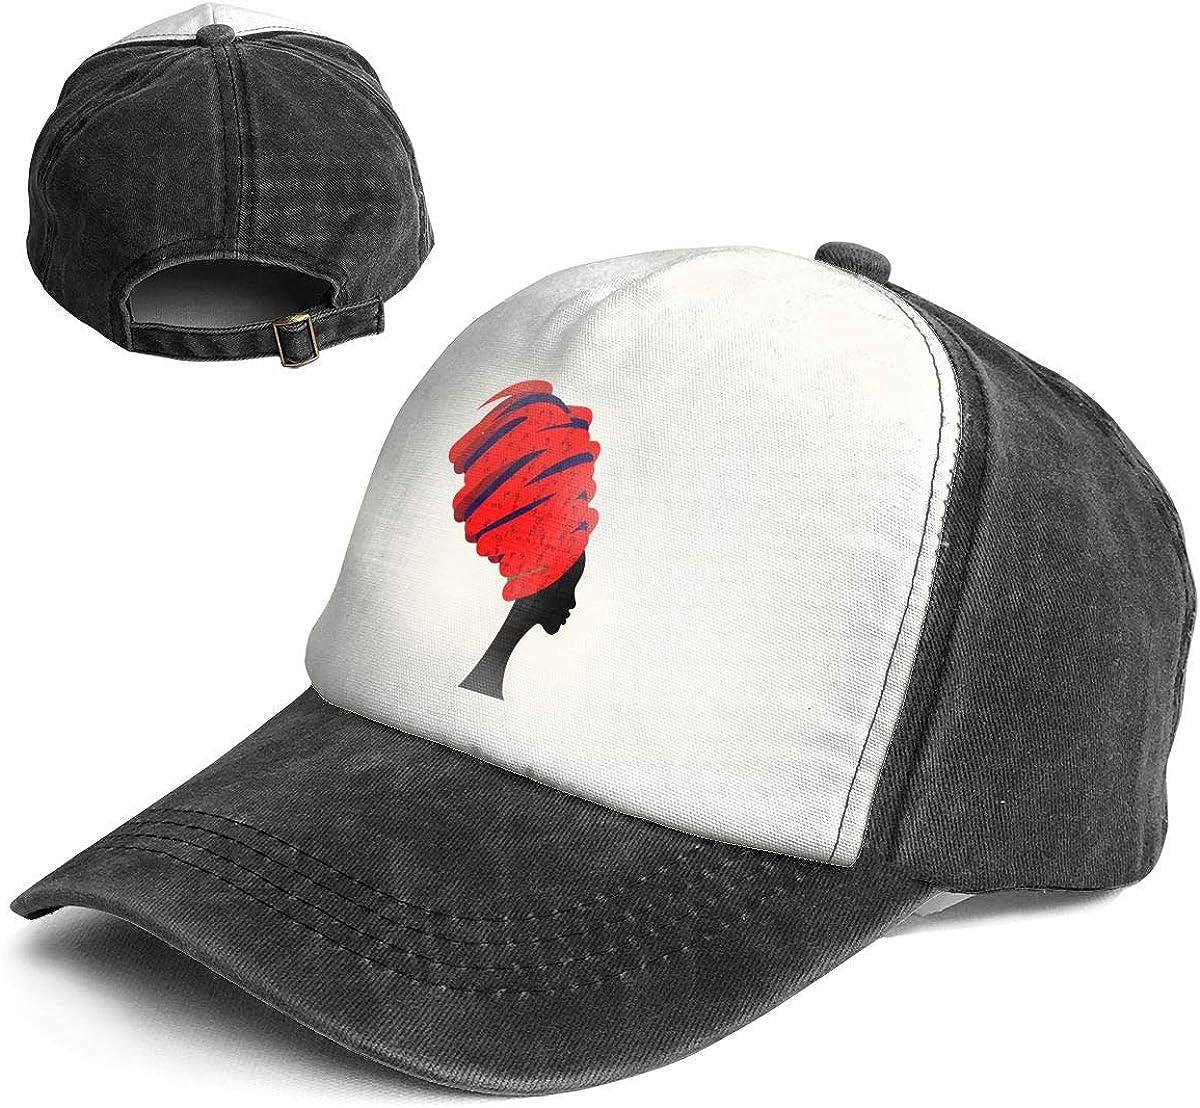 Fashion Vintage Hat African Women Adjustable Dad Hat Baseball Cowboy Cap